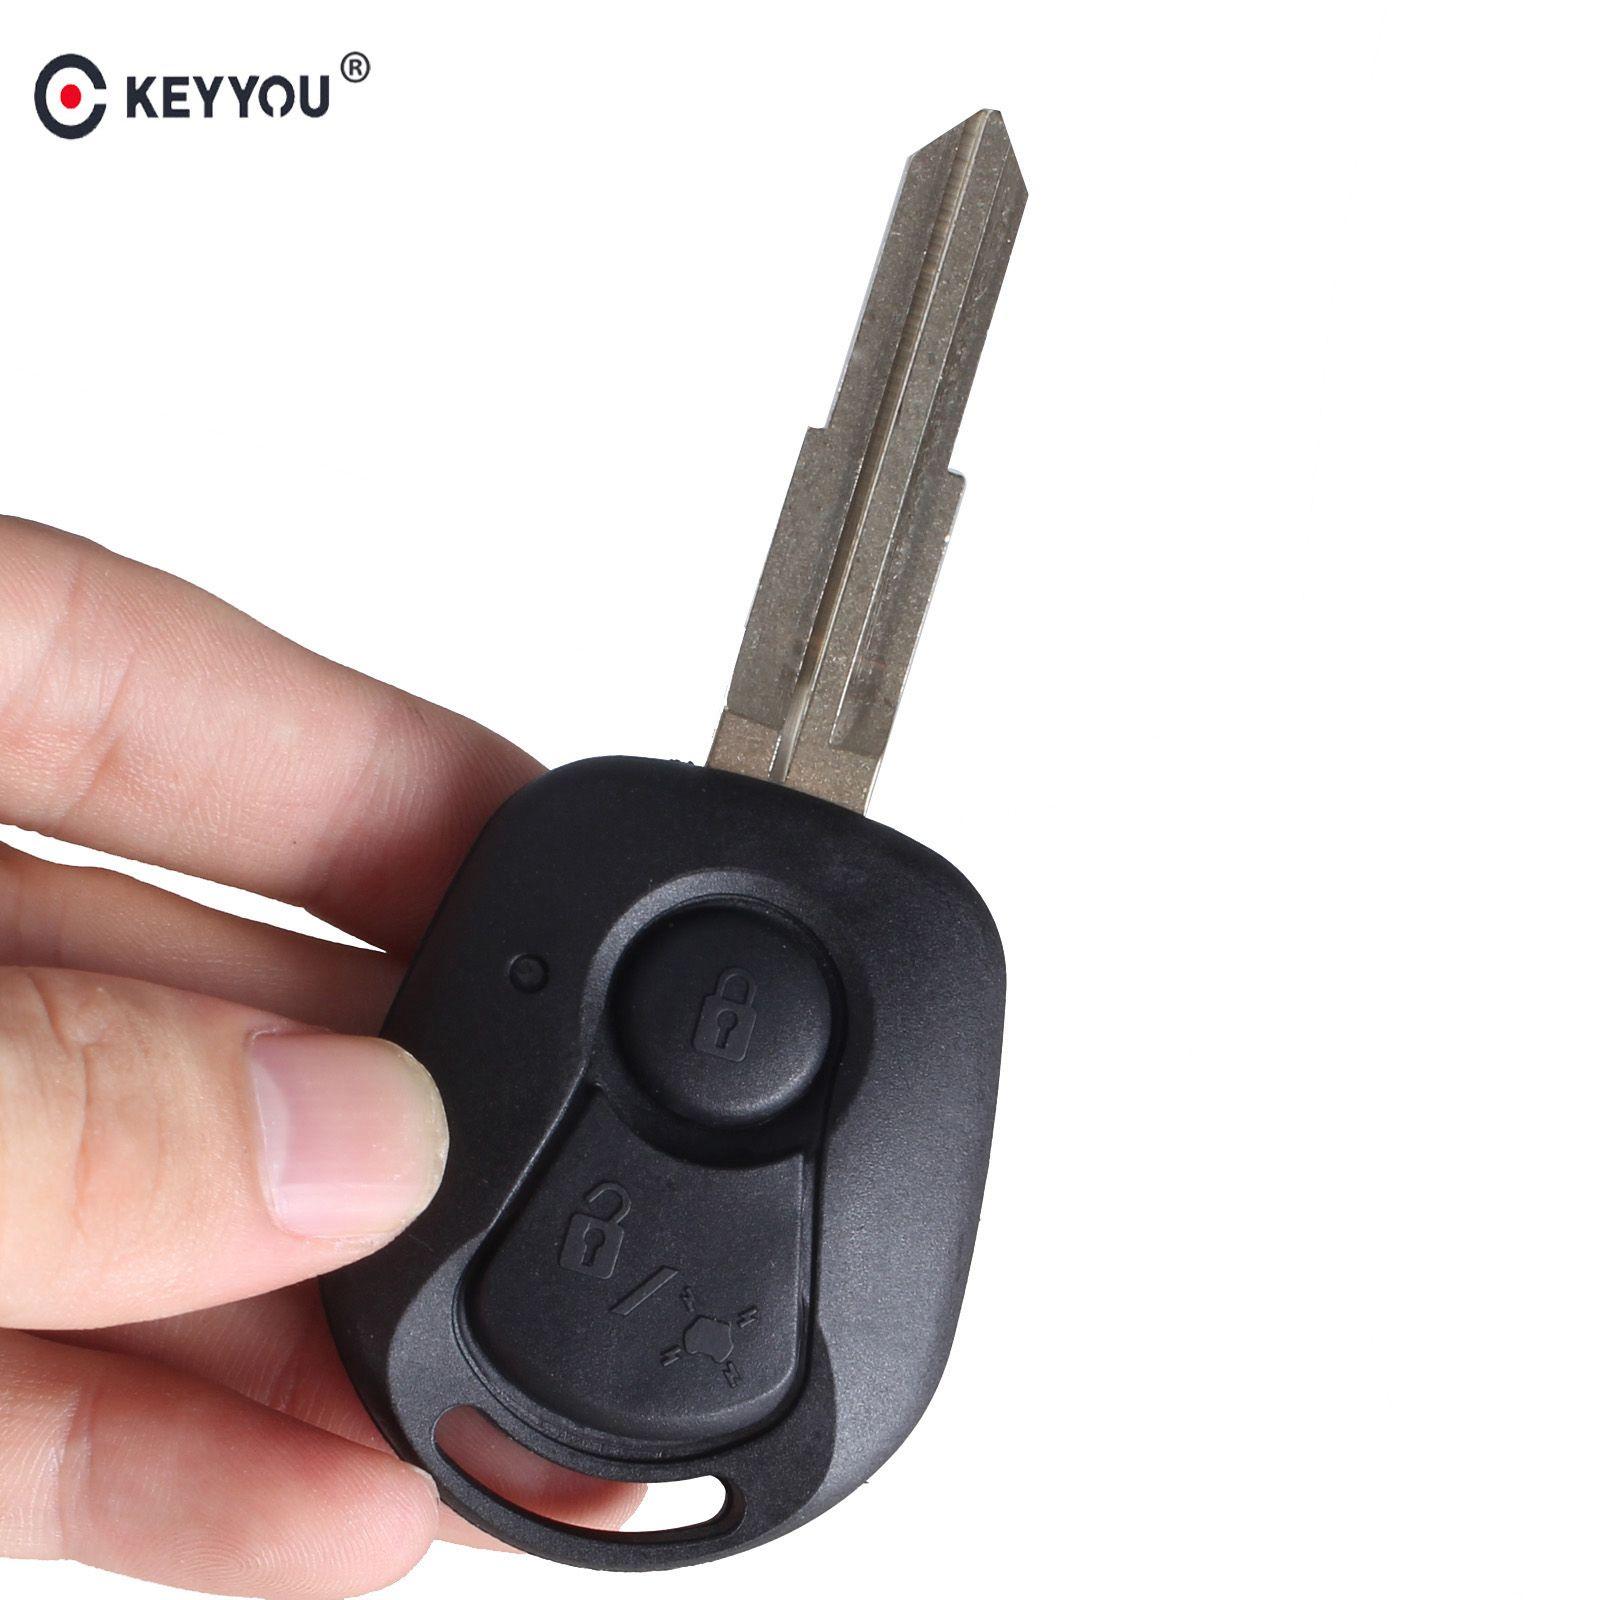 Cheap Car Key KEYYOU New 2 botão remoto Key Fob Caso Shell Titular Capa Para Ssangyong Actyon Kyron Rexton